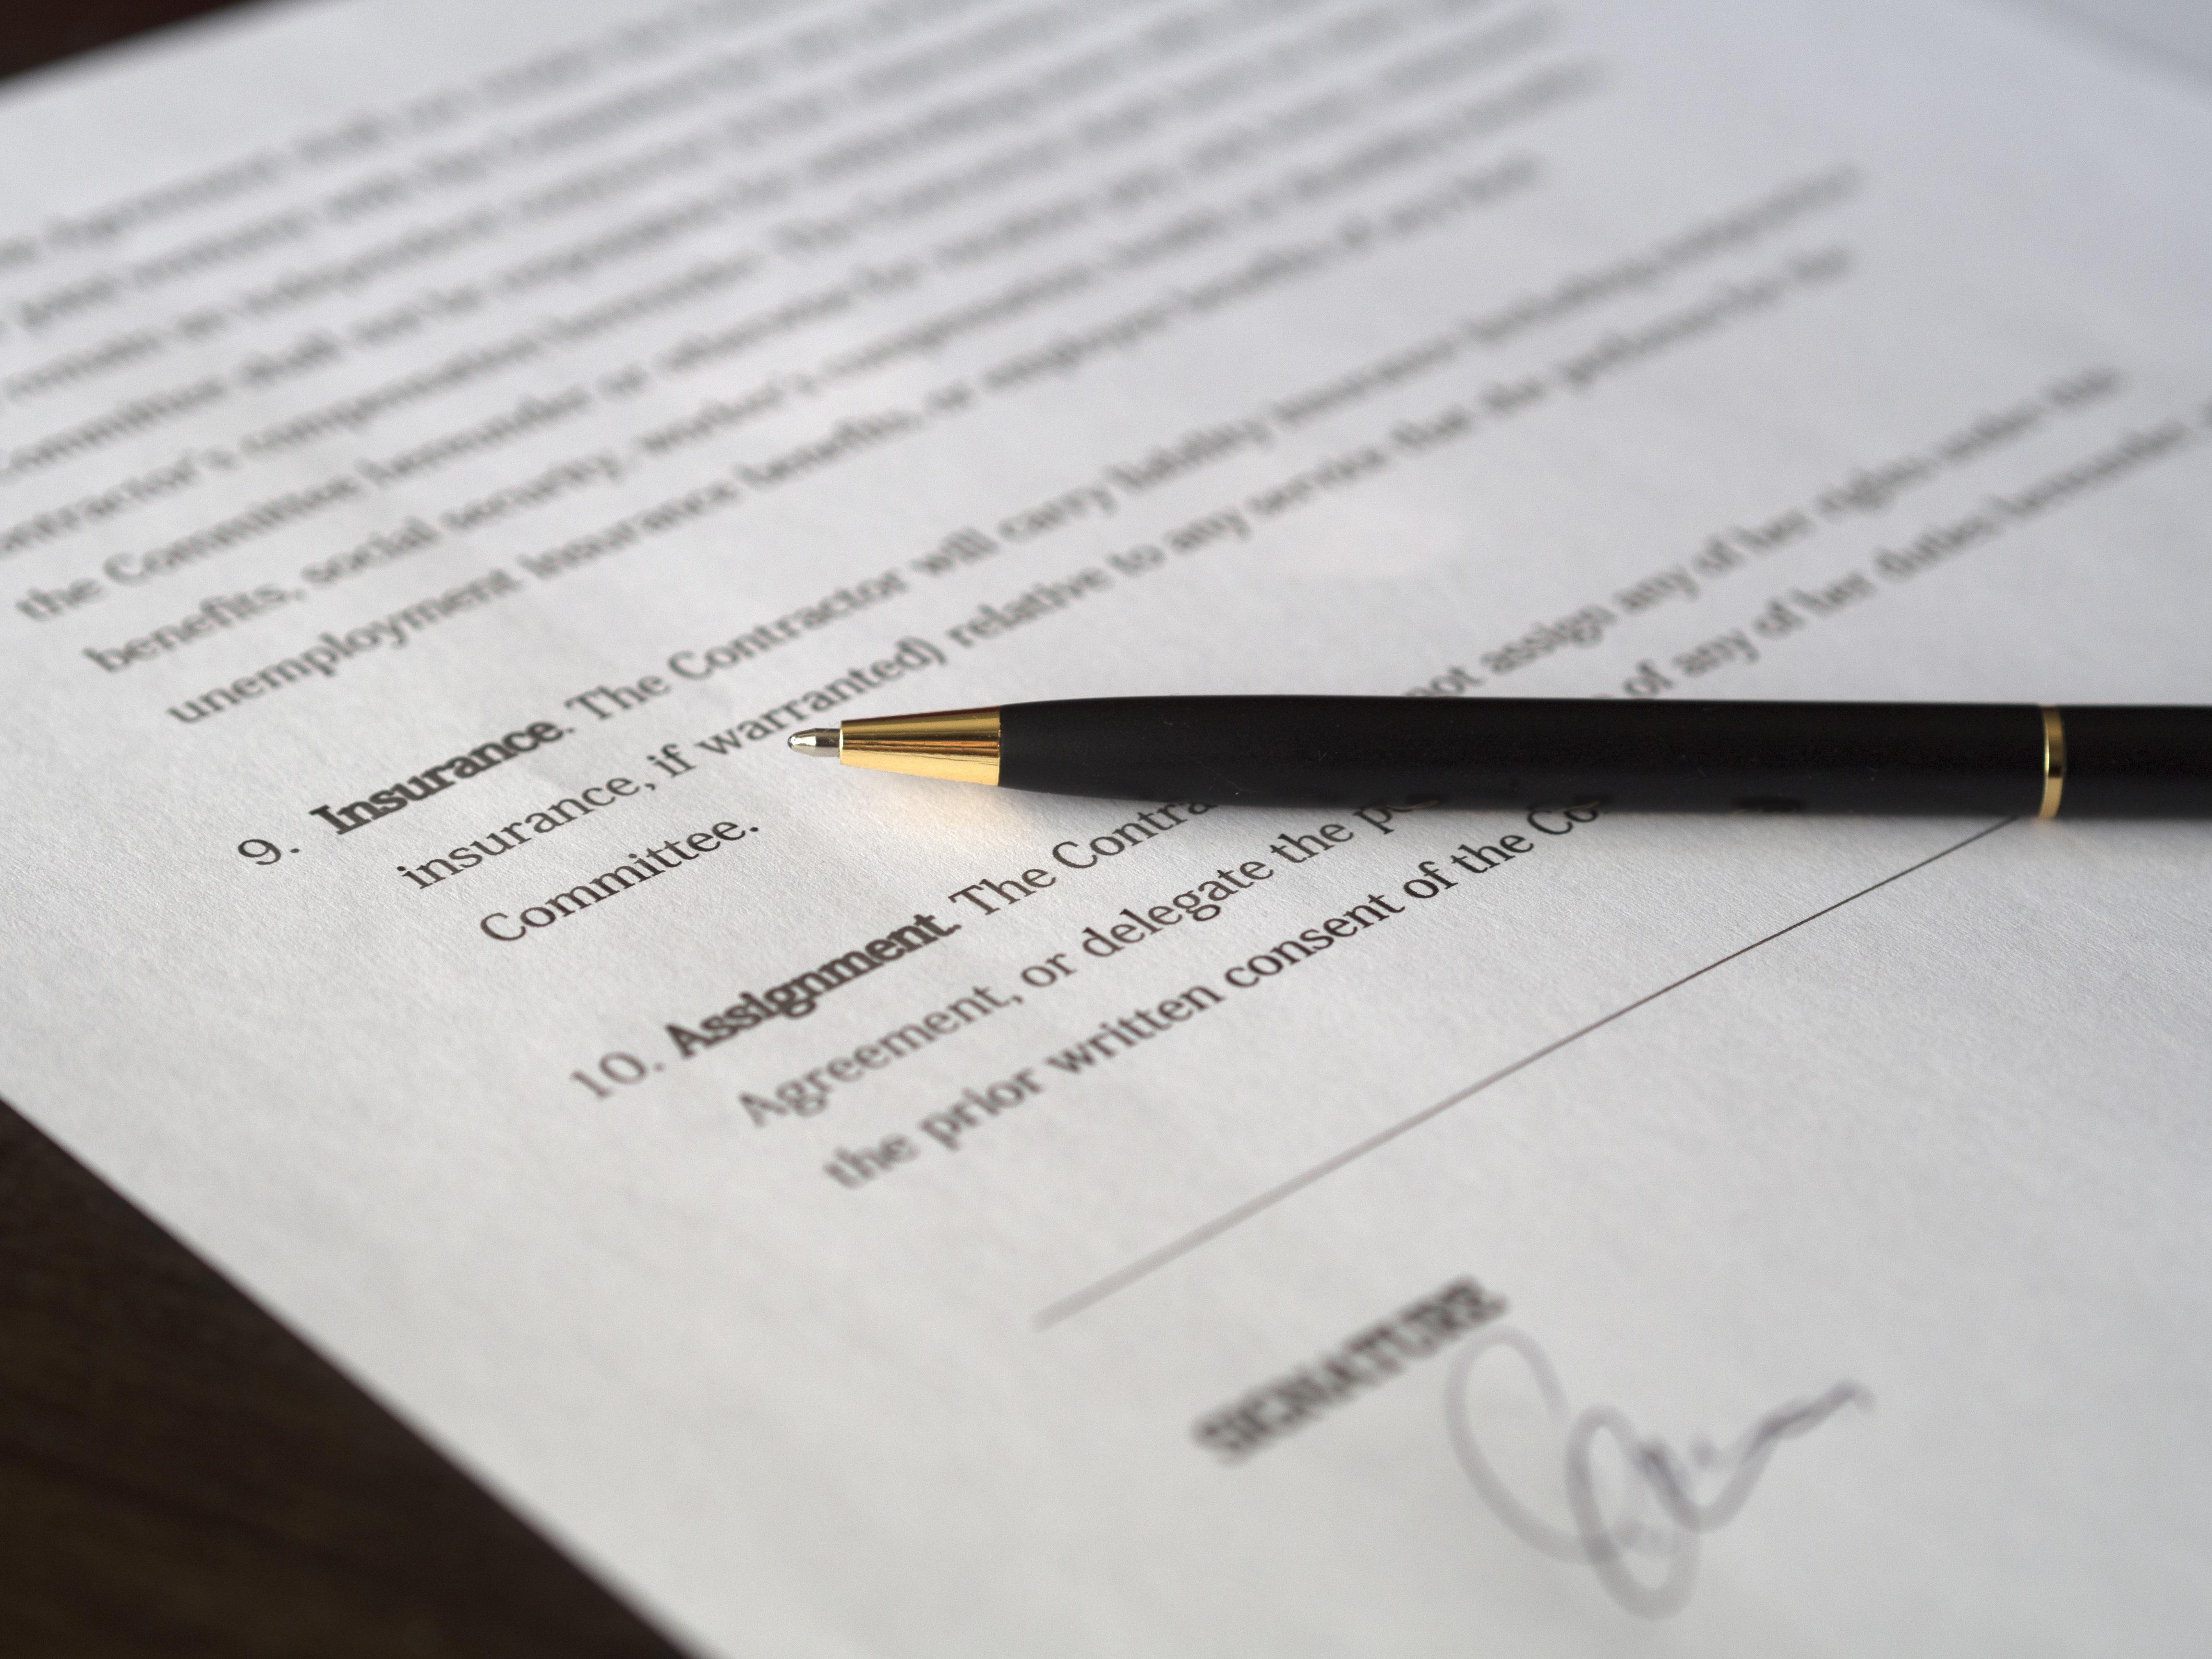 Black pen and white paper